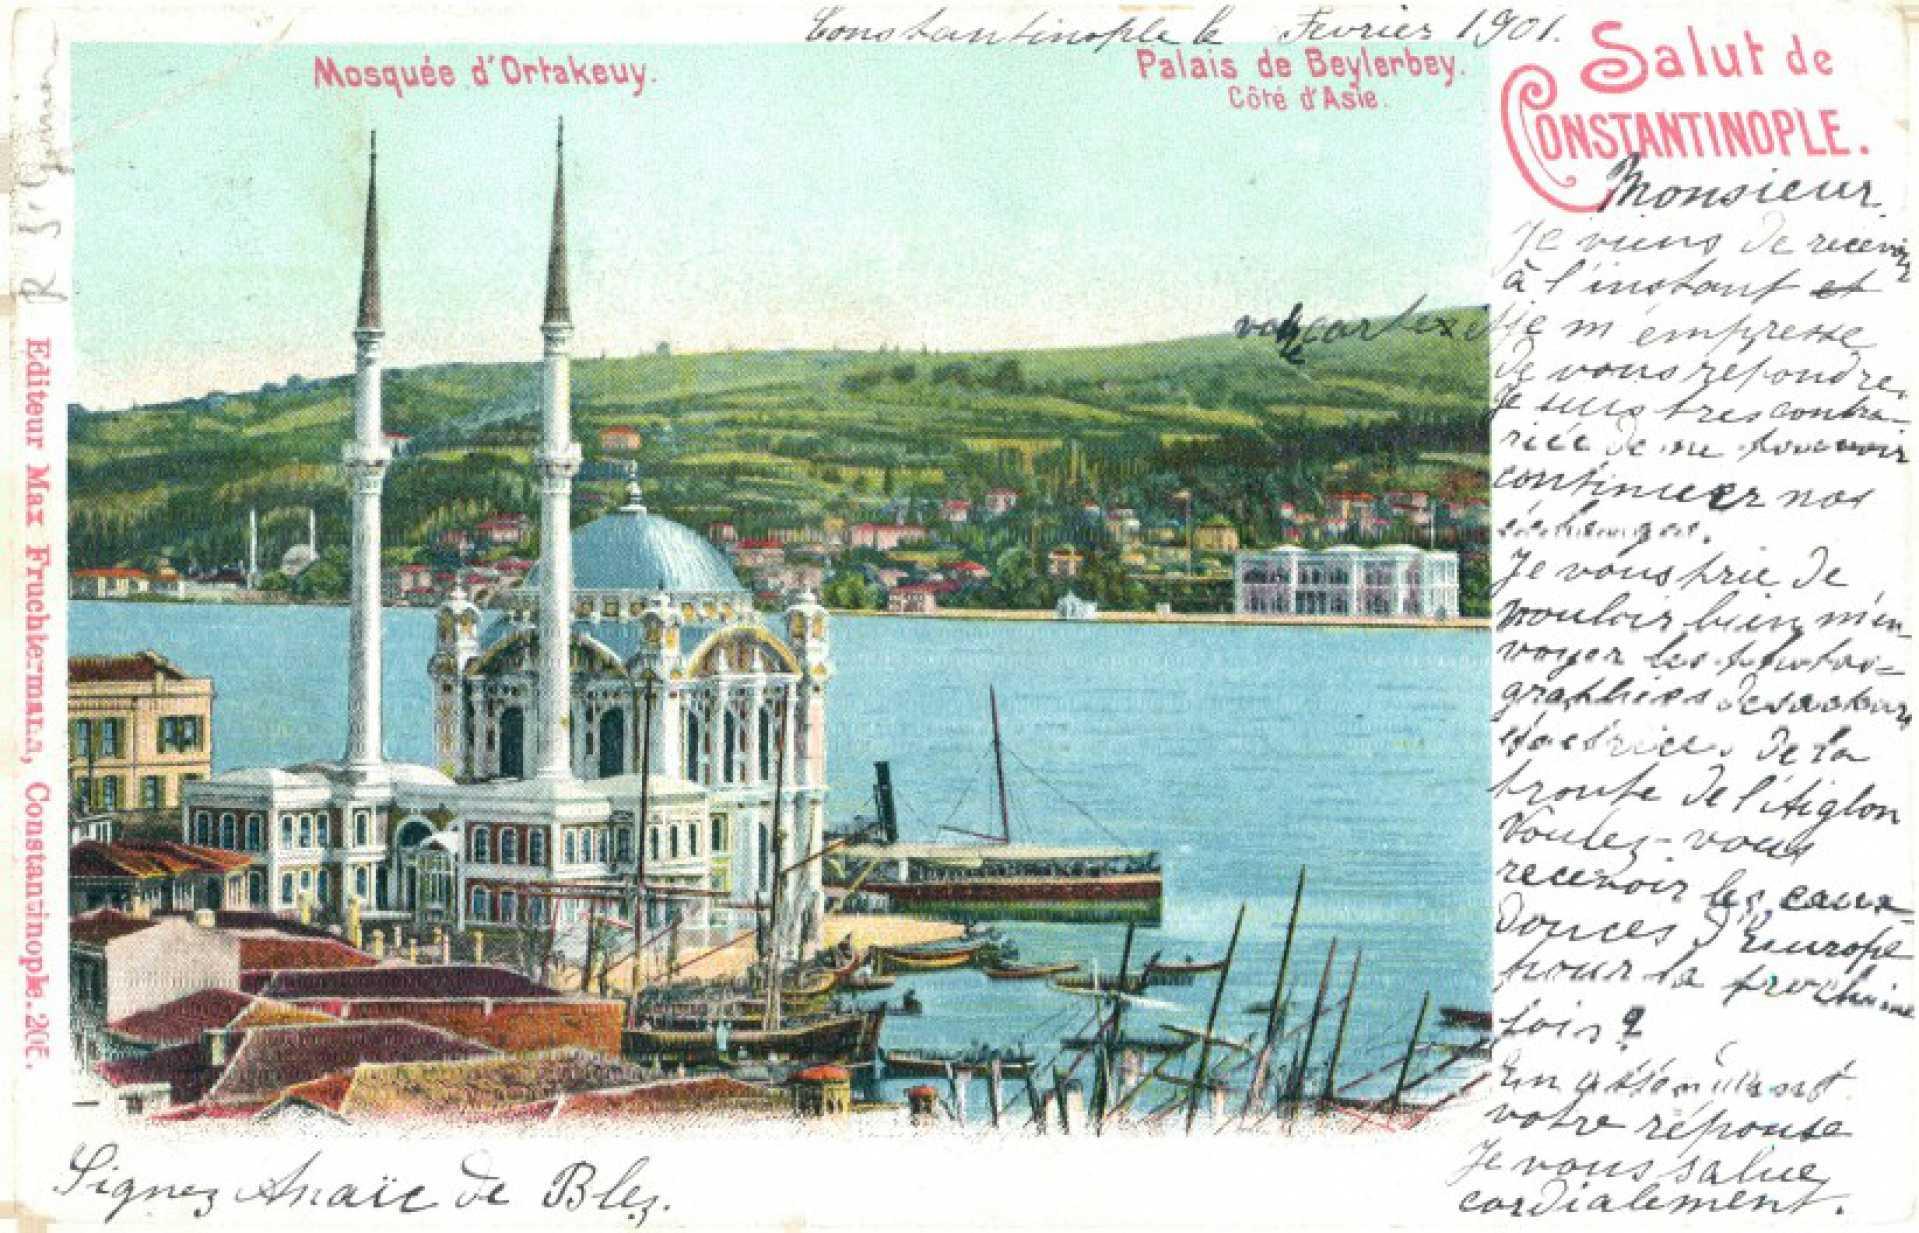 Salut de Constantinople. Mosquee d'Ortakeuy  Palais de Beylerbey Cote d'Asie